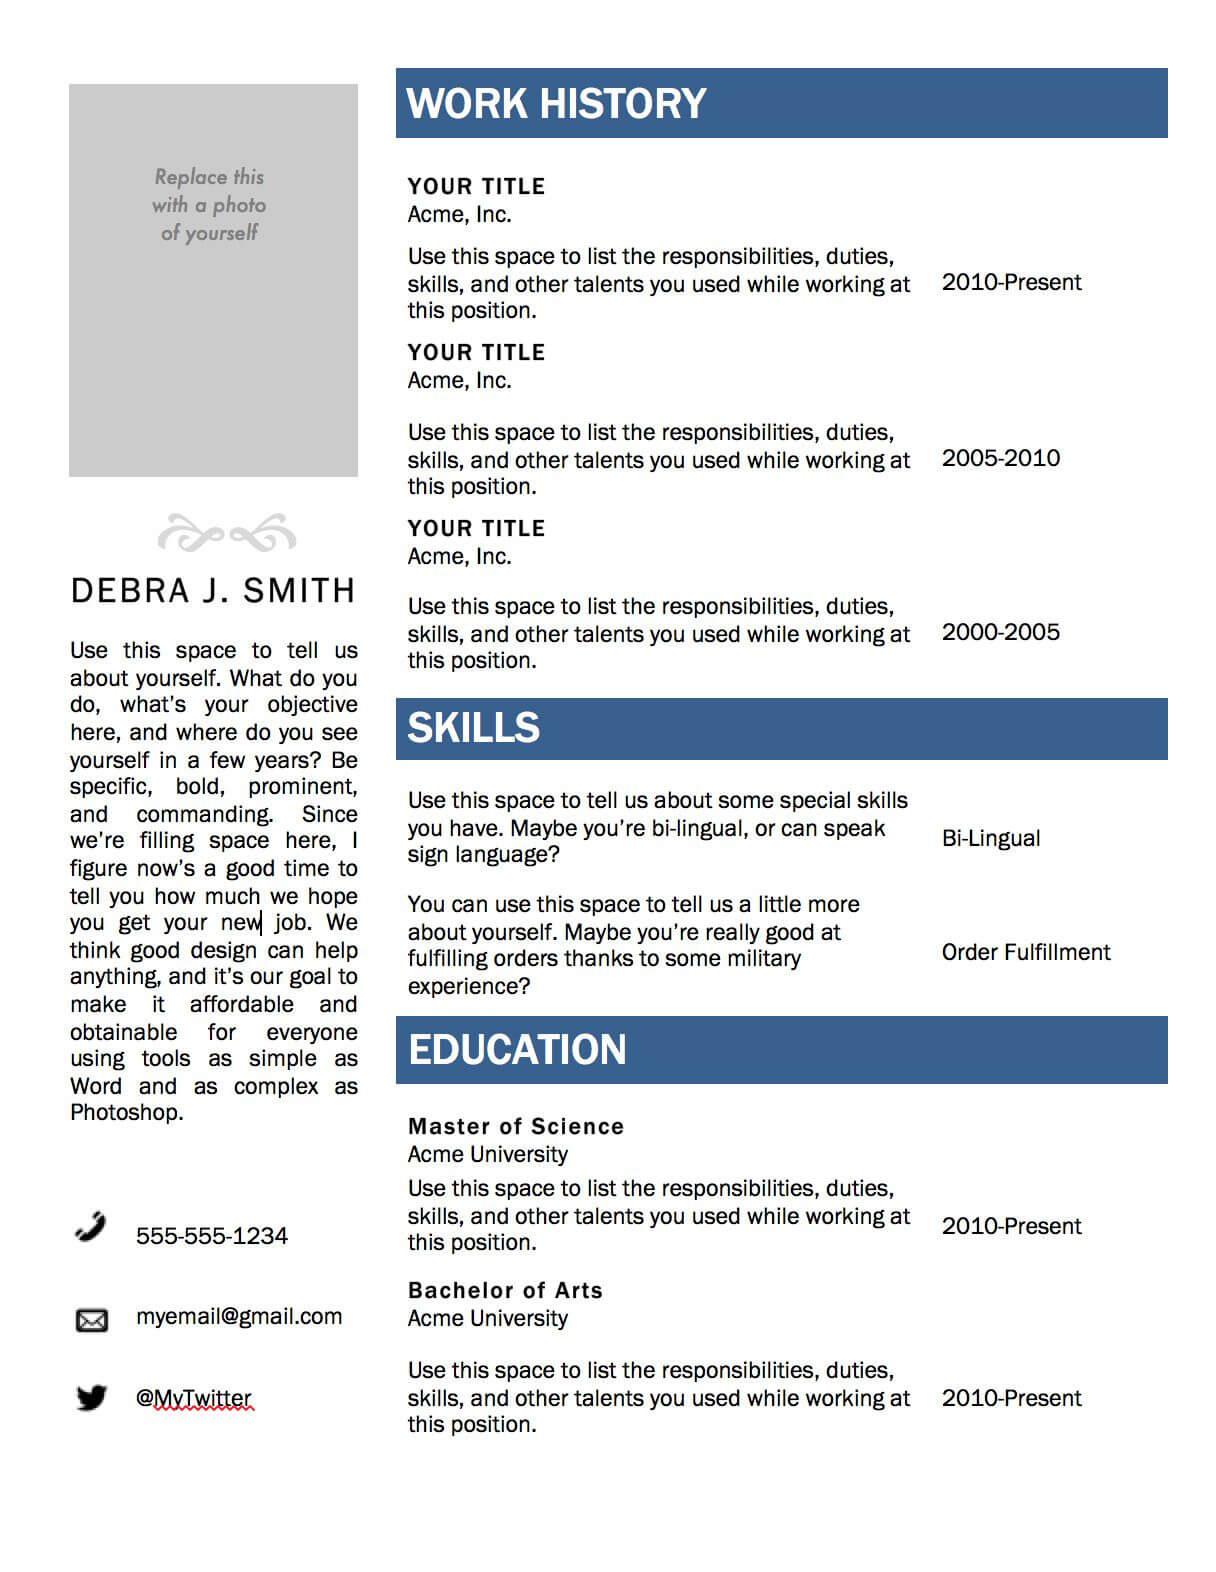 Free Microsoft Word Resume Template | Microsoft Word Resume For Resume Templates Word 2010